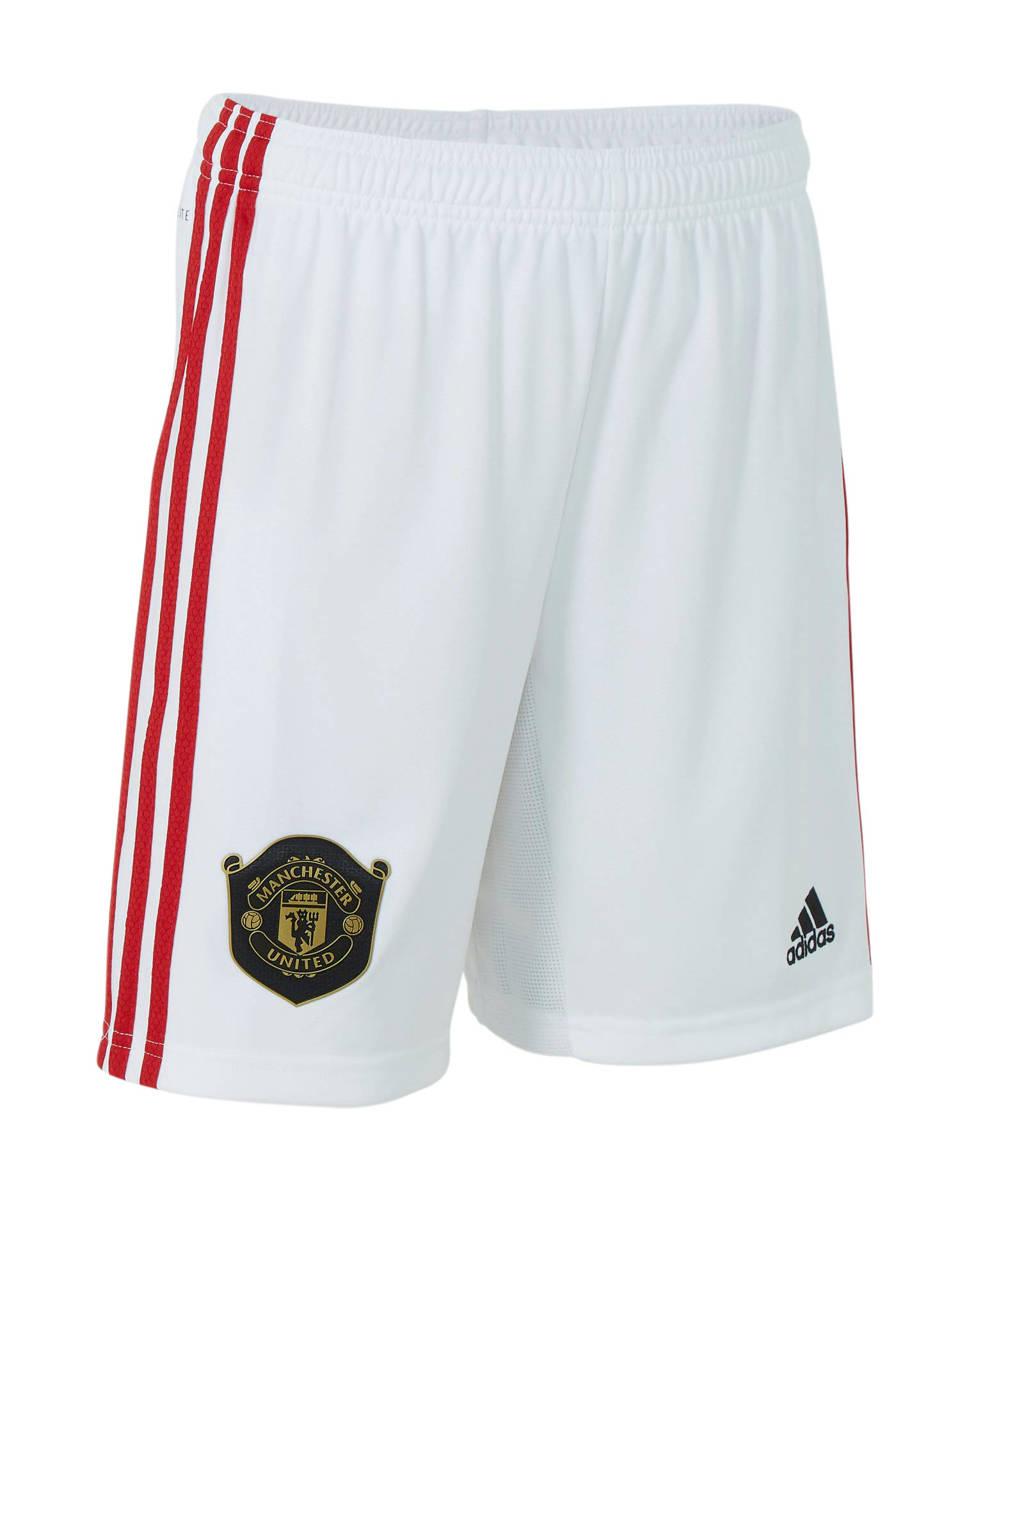 adidas Junior Manchester United voetbalshort Thuis, Wit